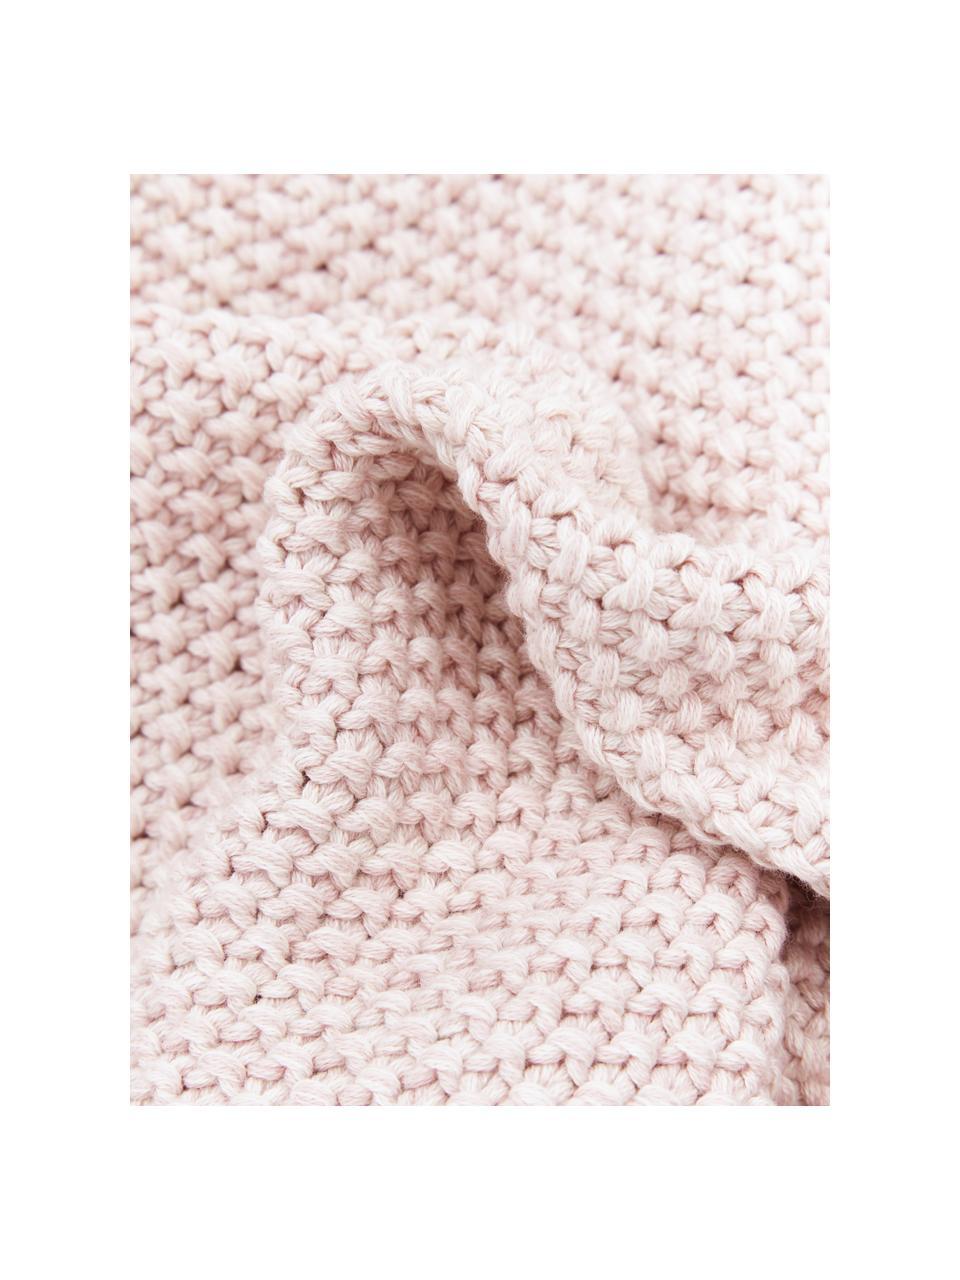 Strick-Kissenhülle Wilma in Rosa mit Perlmuster, 100% Baumwolle, Rosa, meliert, 40 x 40 cm